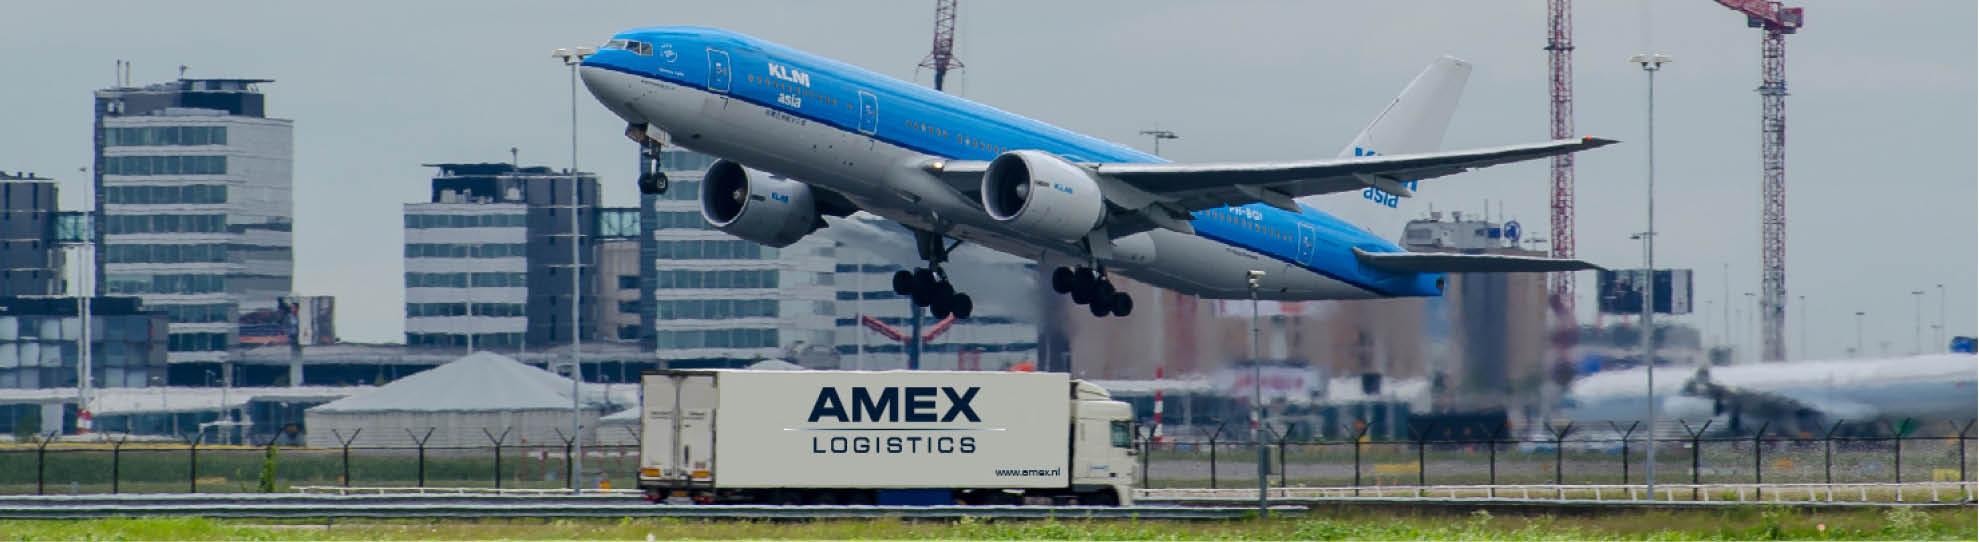 amex_transport_schiphol